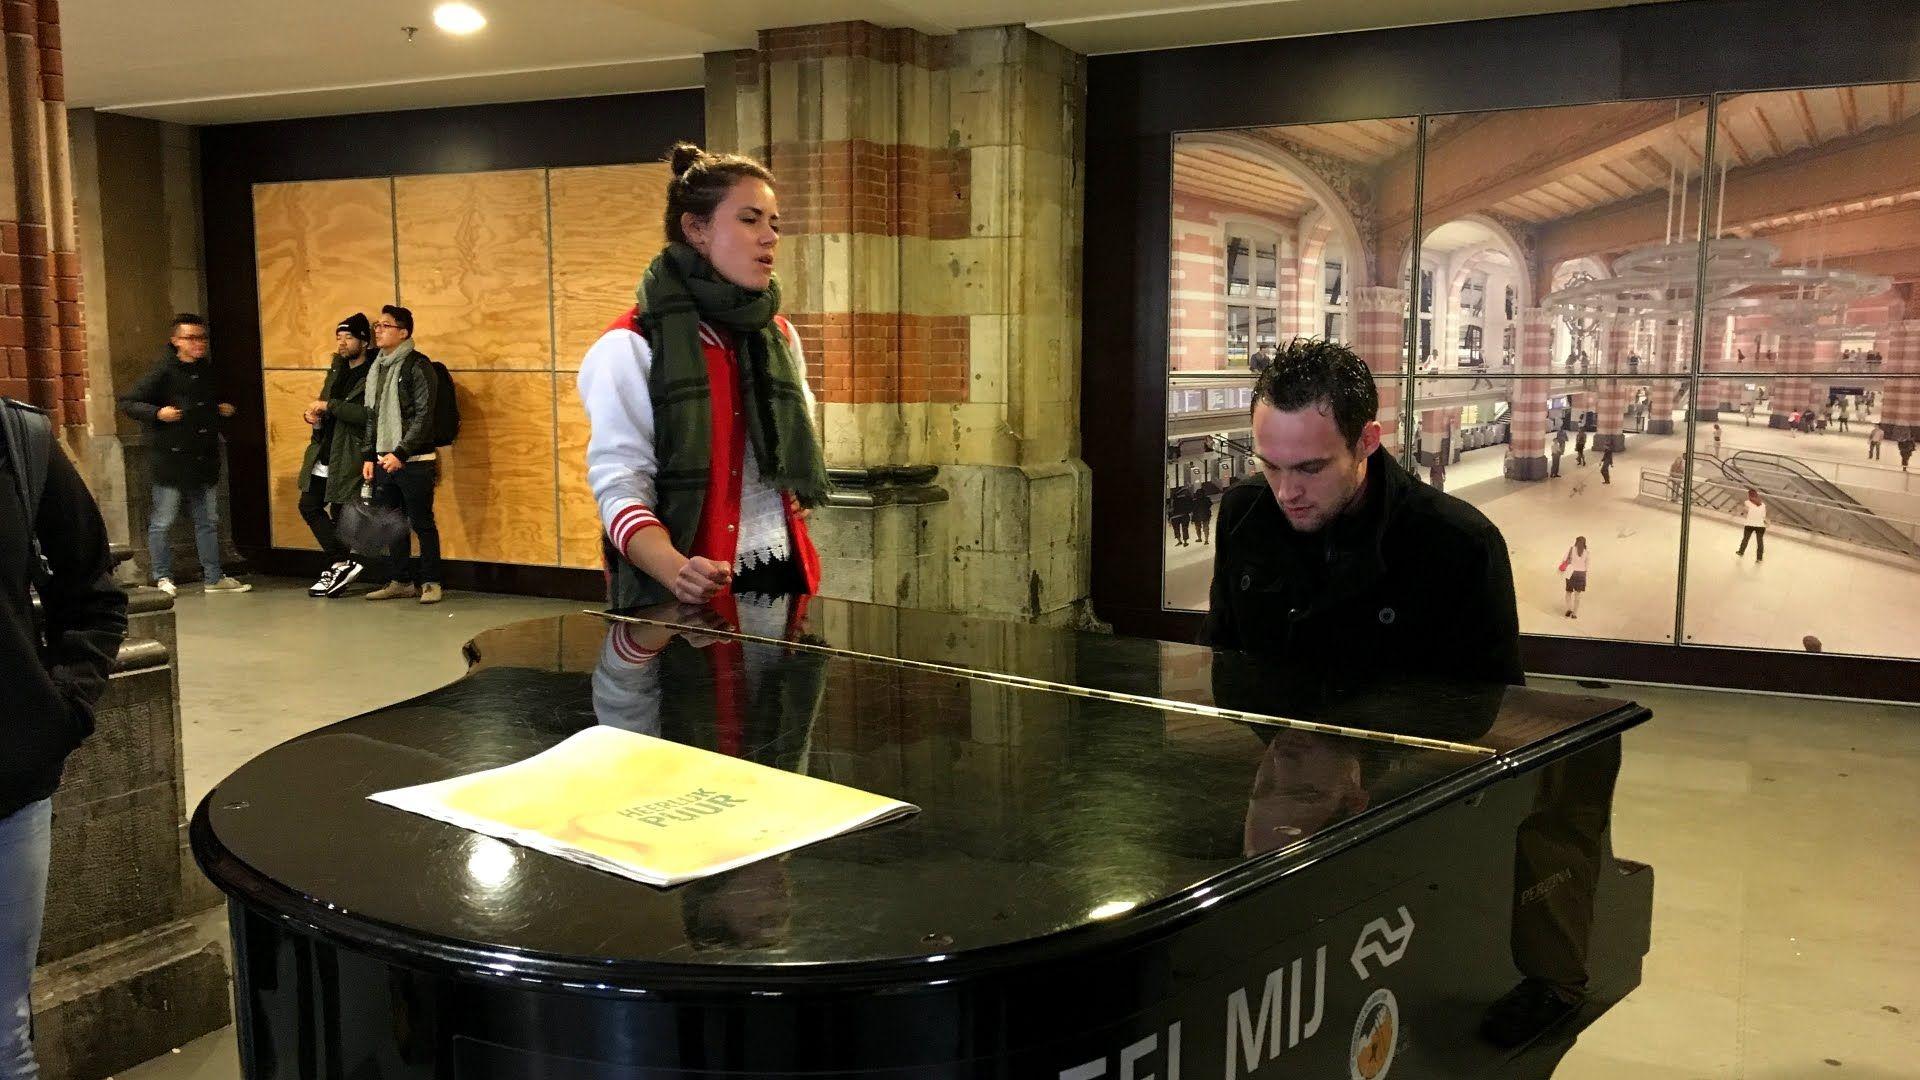 Amazing Random Piano Session @ Amsterdam Centraal Station